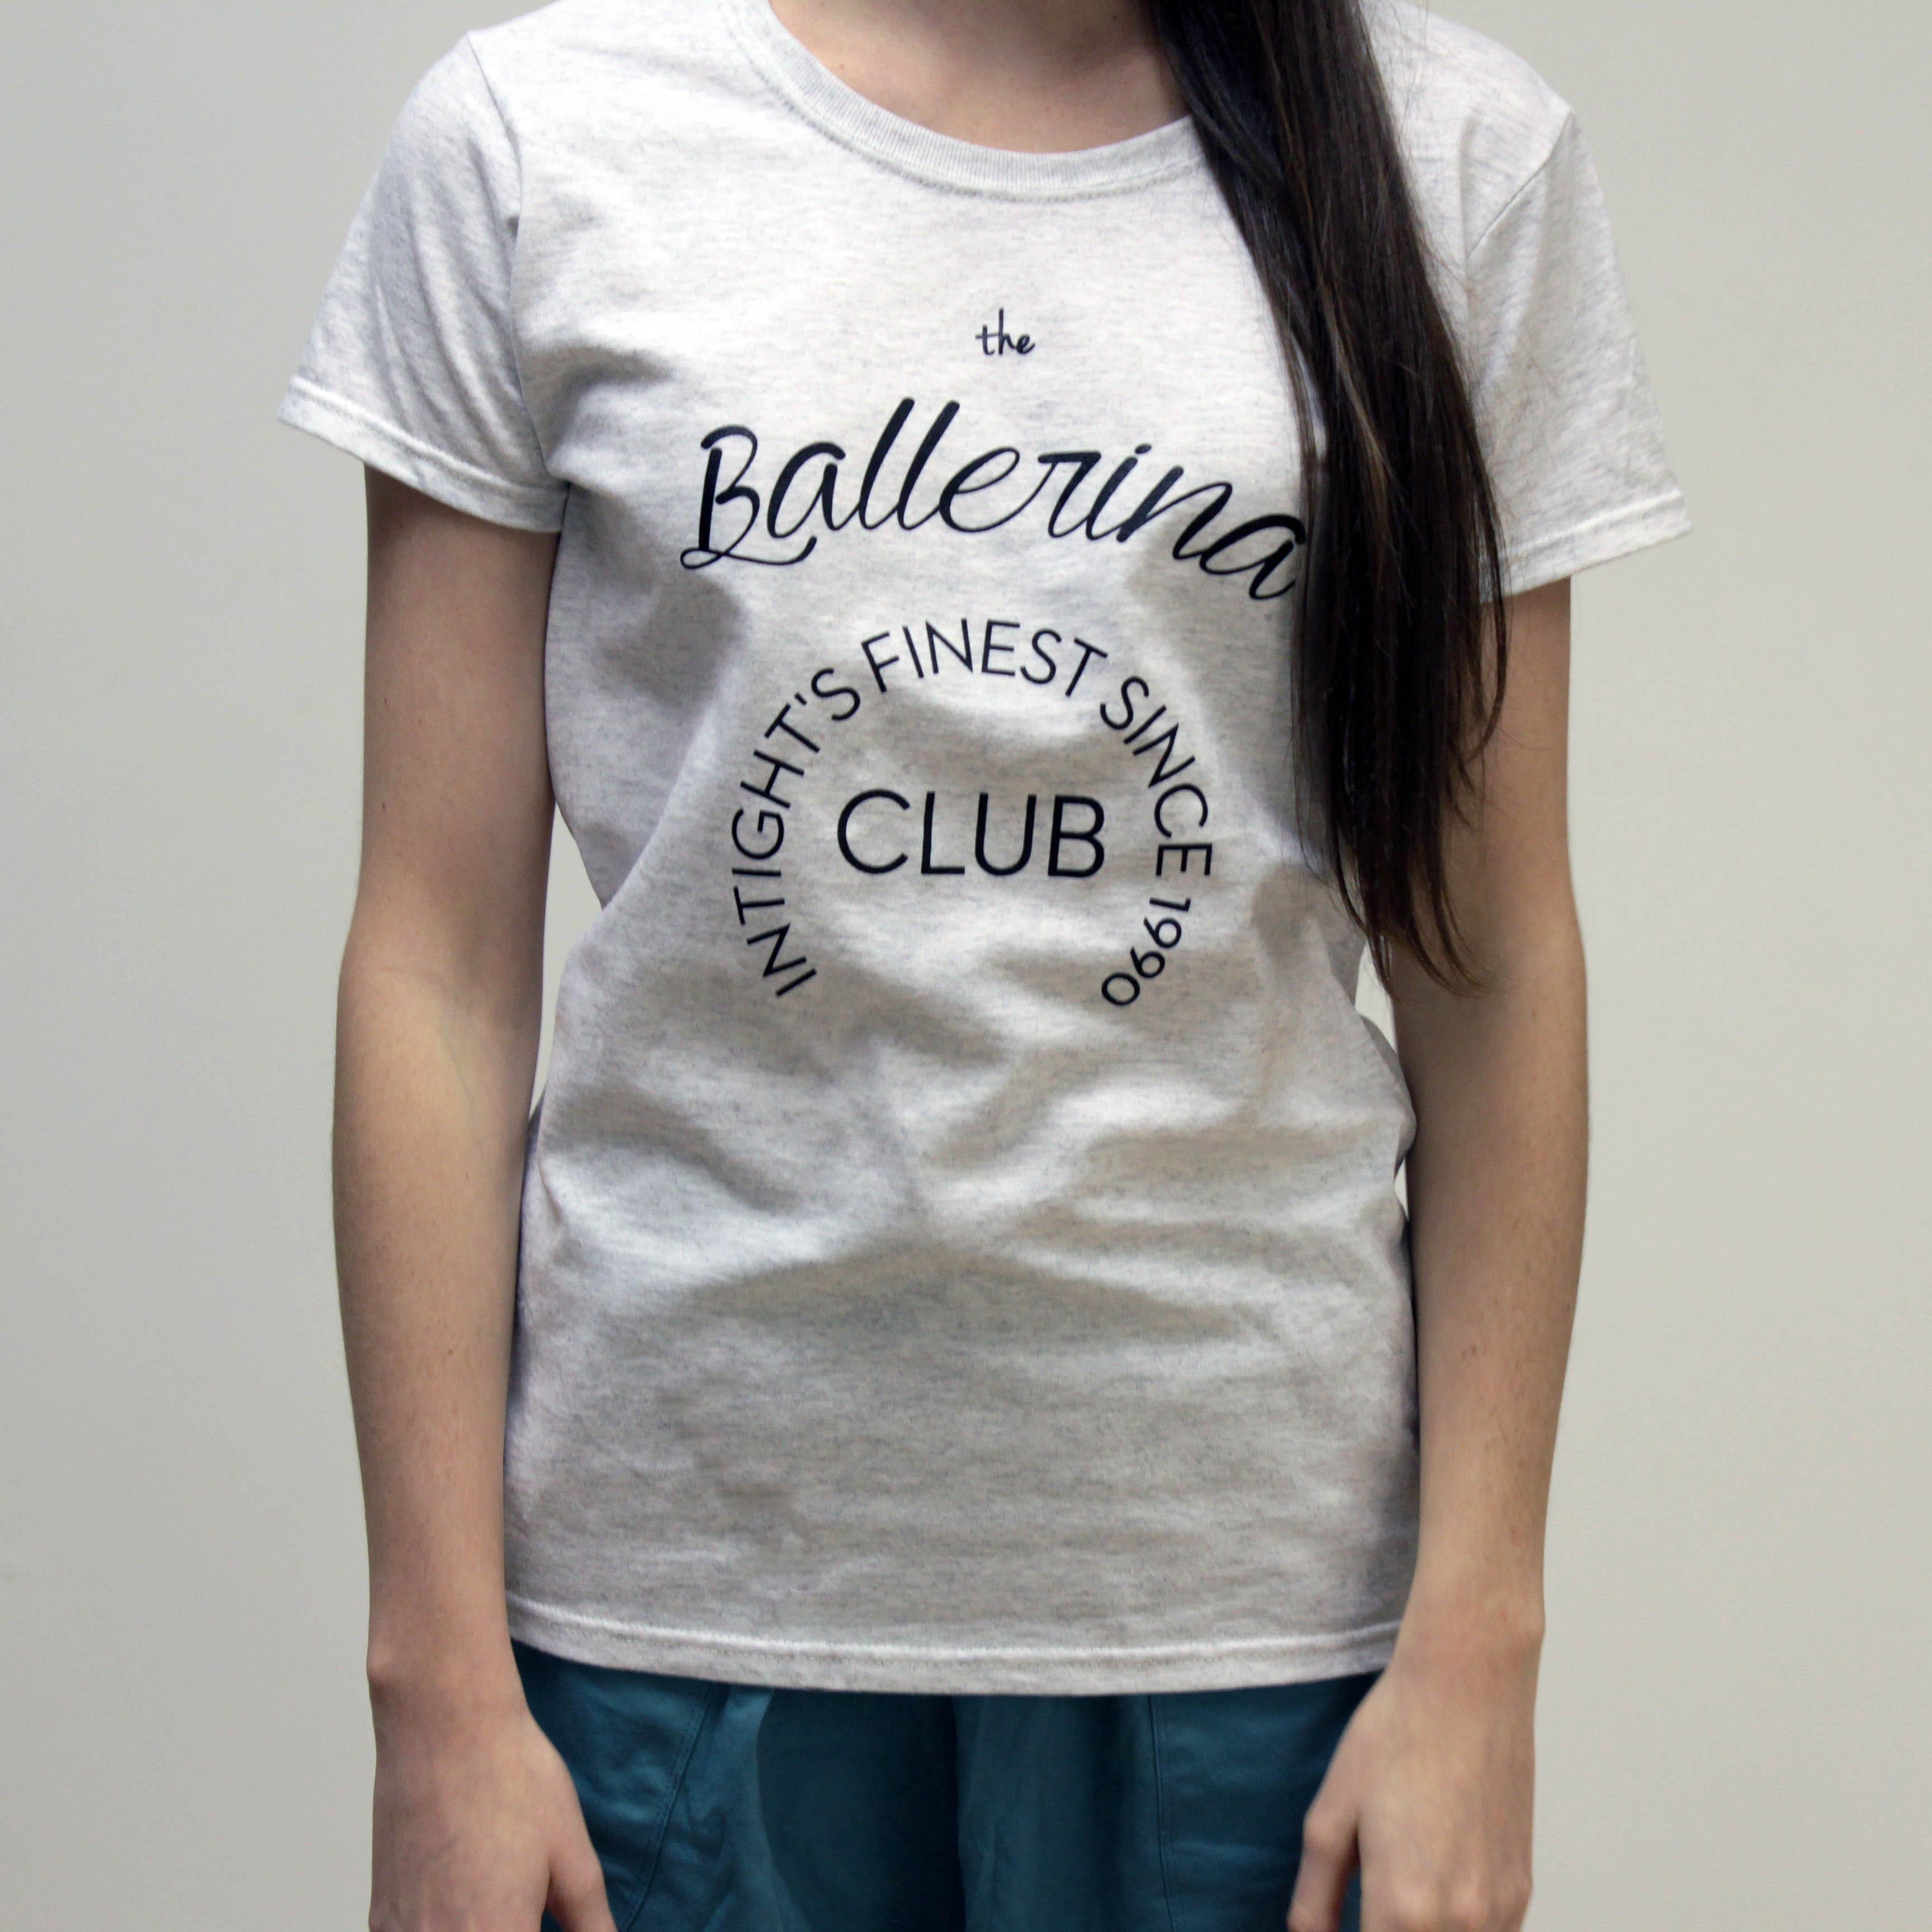 Ballerina Club Close up.jpg